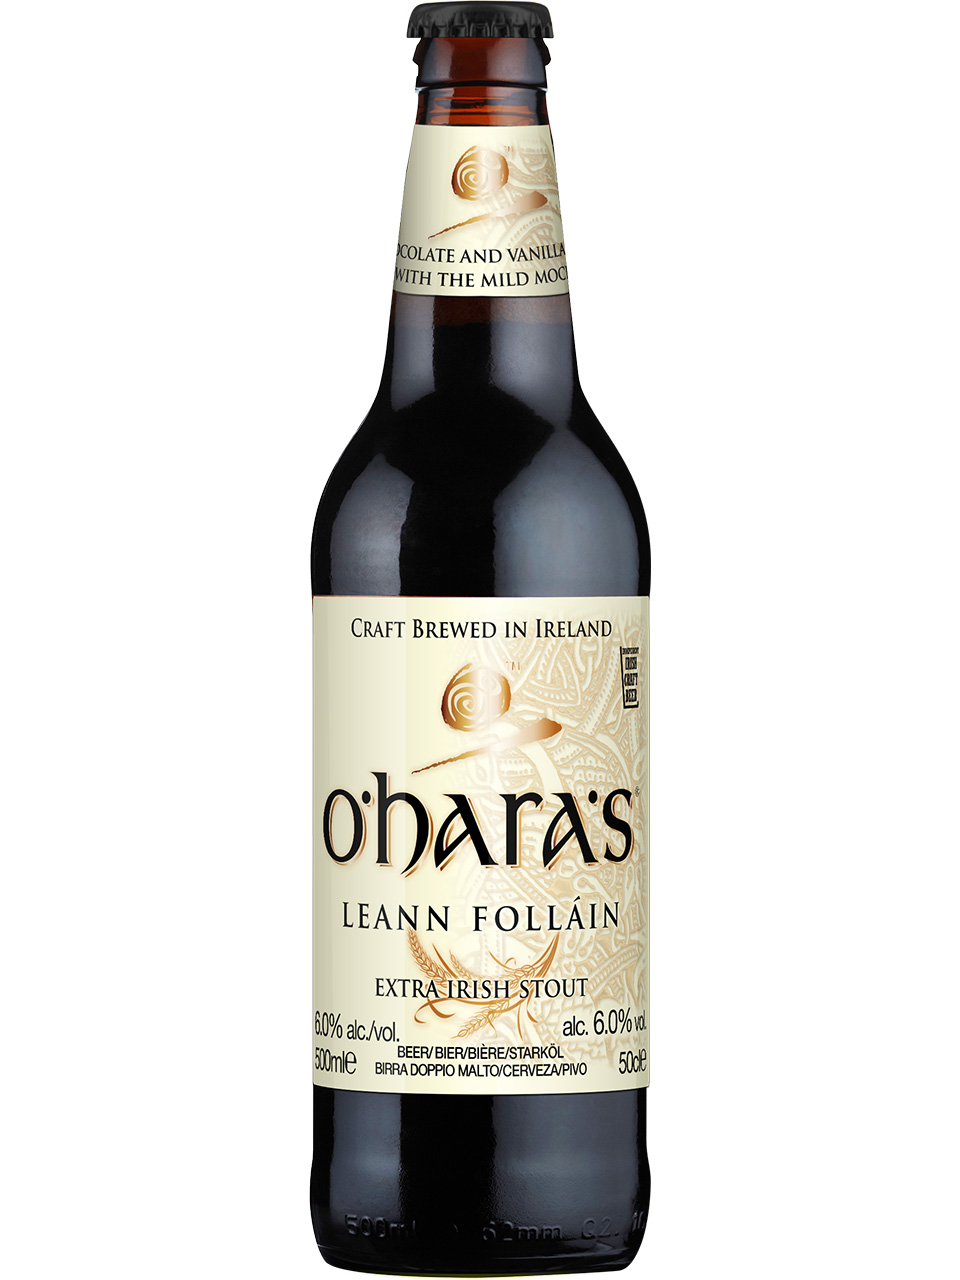 O'hara's Leann Follain 500ml Bottle